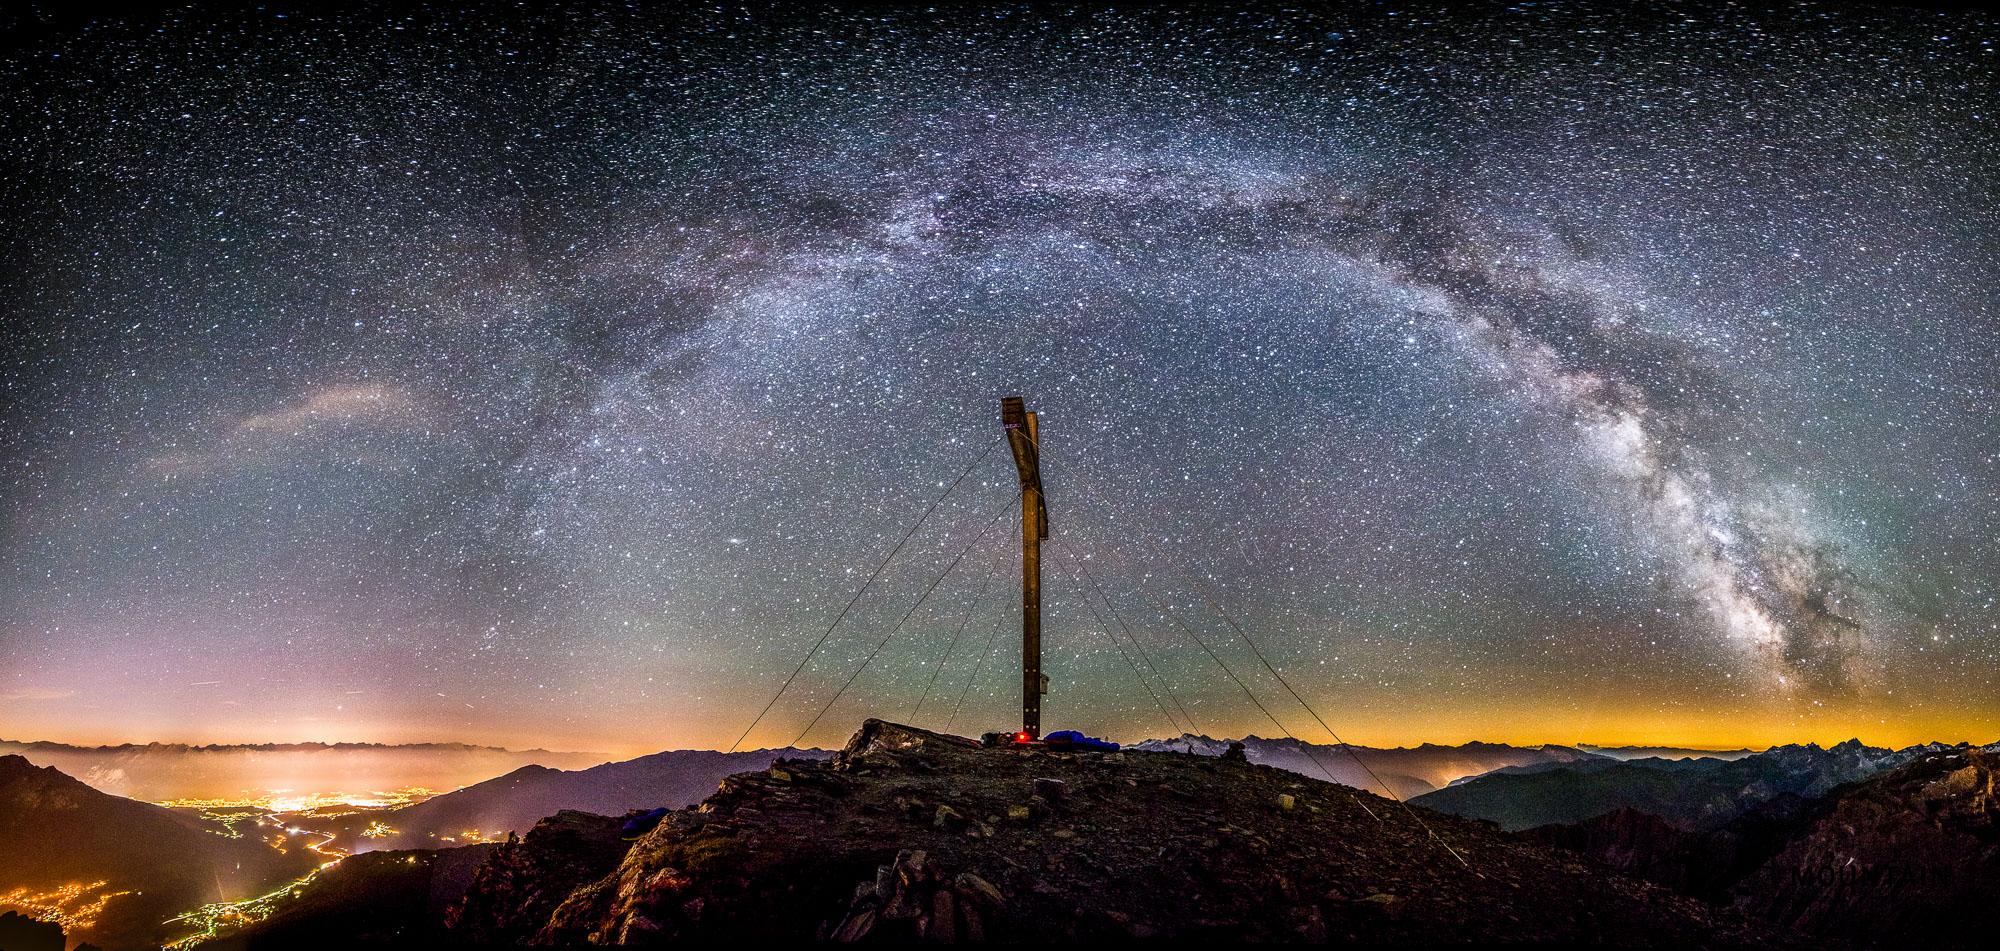 Sterne + Milchstraße fotografieren – Step by Step Guide [20]